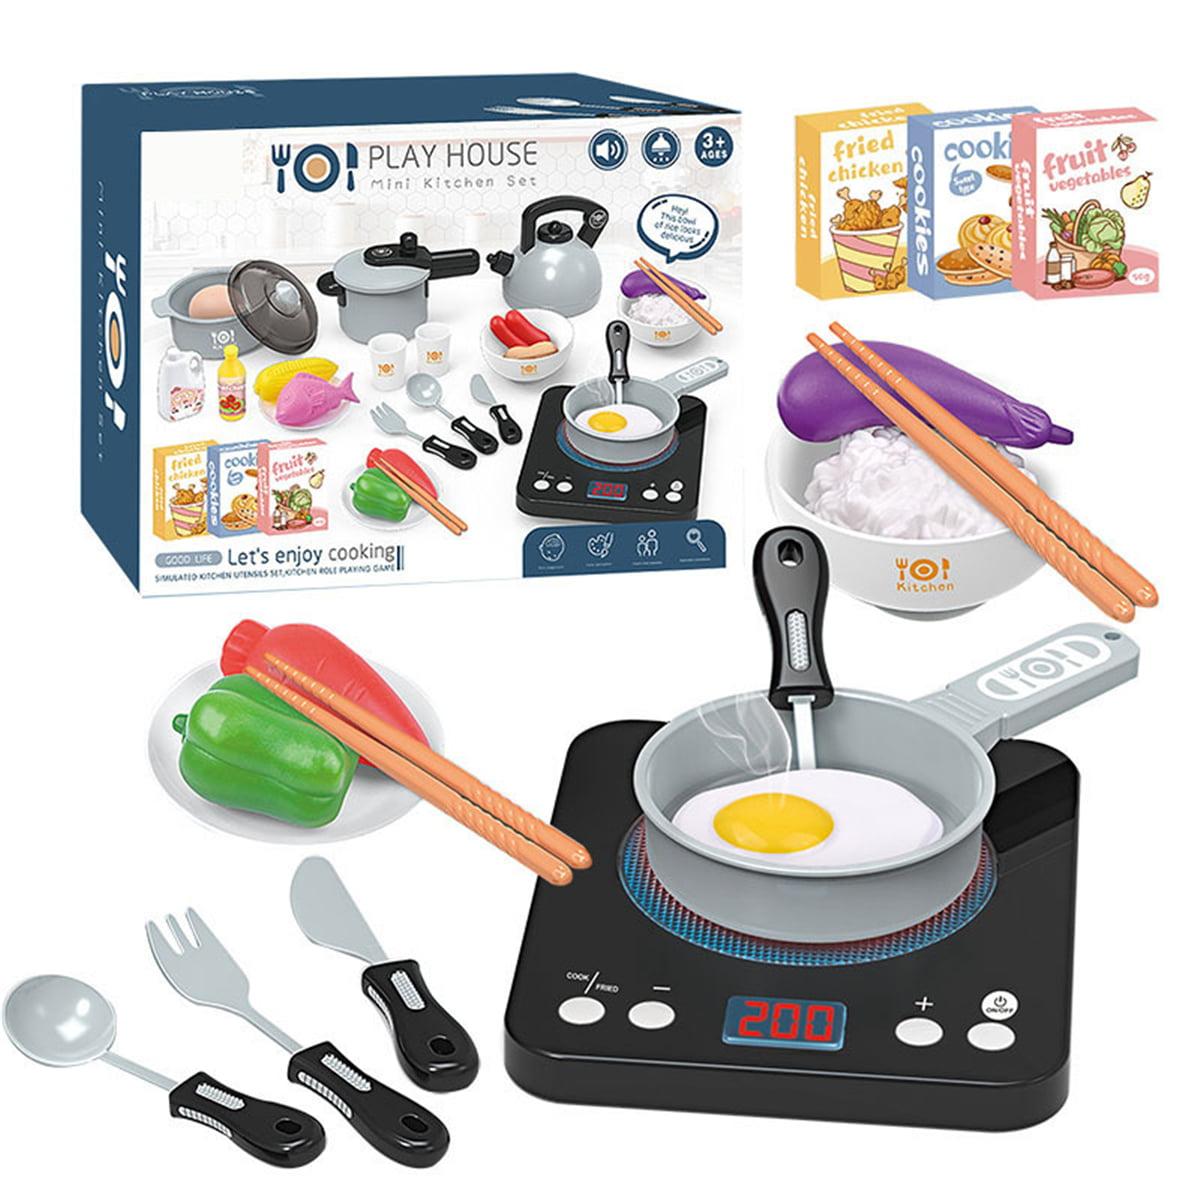 36pcs Children Mini Kitchen Toys Food Cookware Pot Pan Cooking Play House Walmart Com Walmart Com